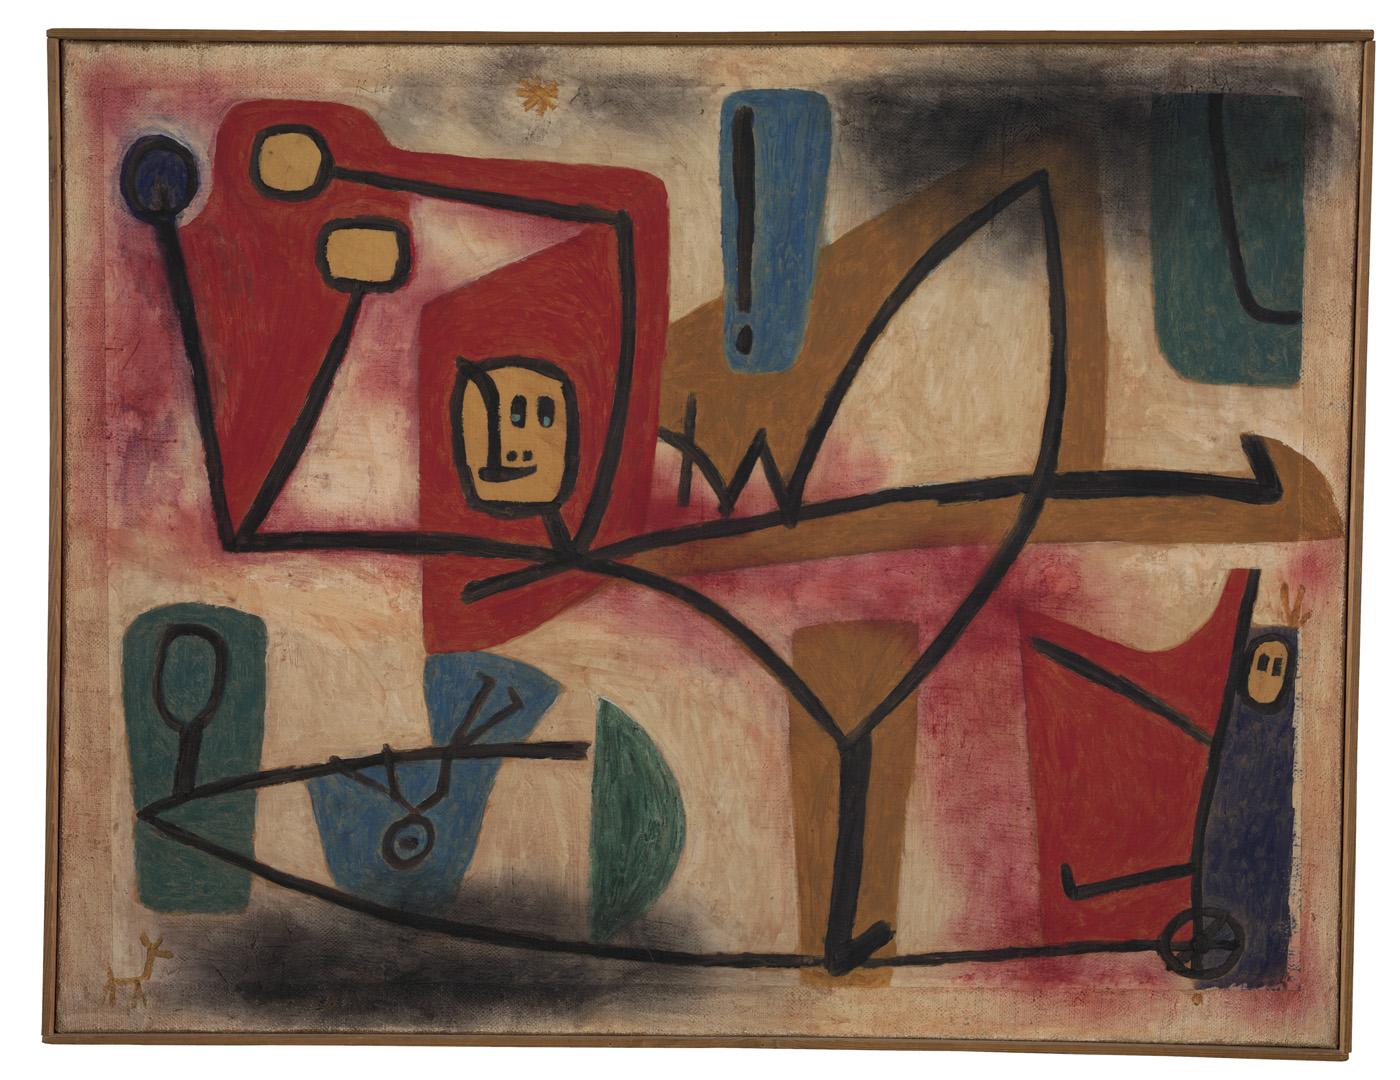 "Paul Klee, ""Übermut Exubérance"" (1939), oil and color glue paint on paper on hessian canvas (courtesy Zentrum Paul Klee, Bern)"